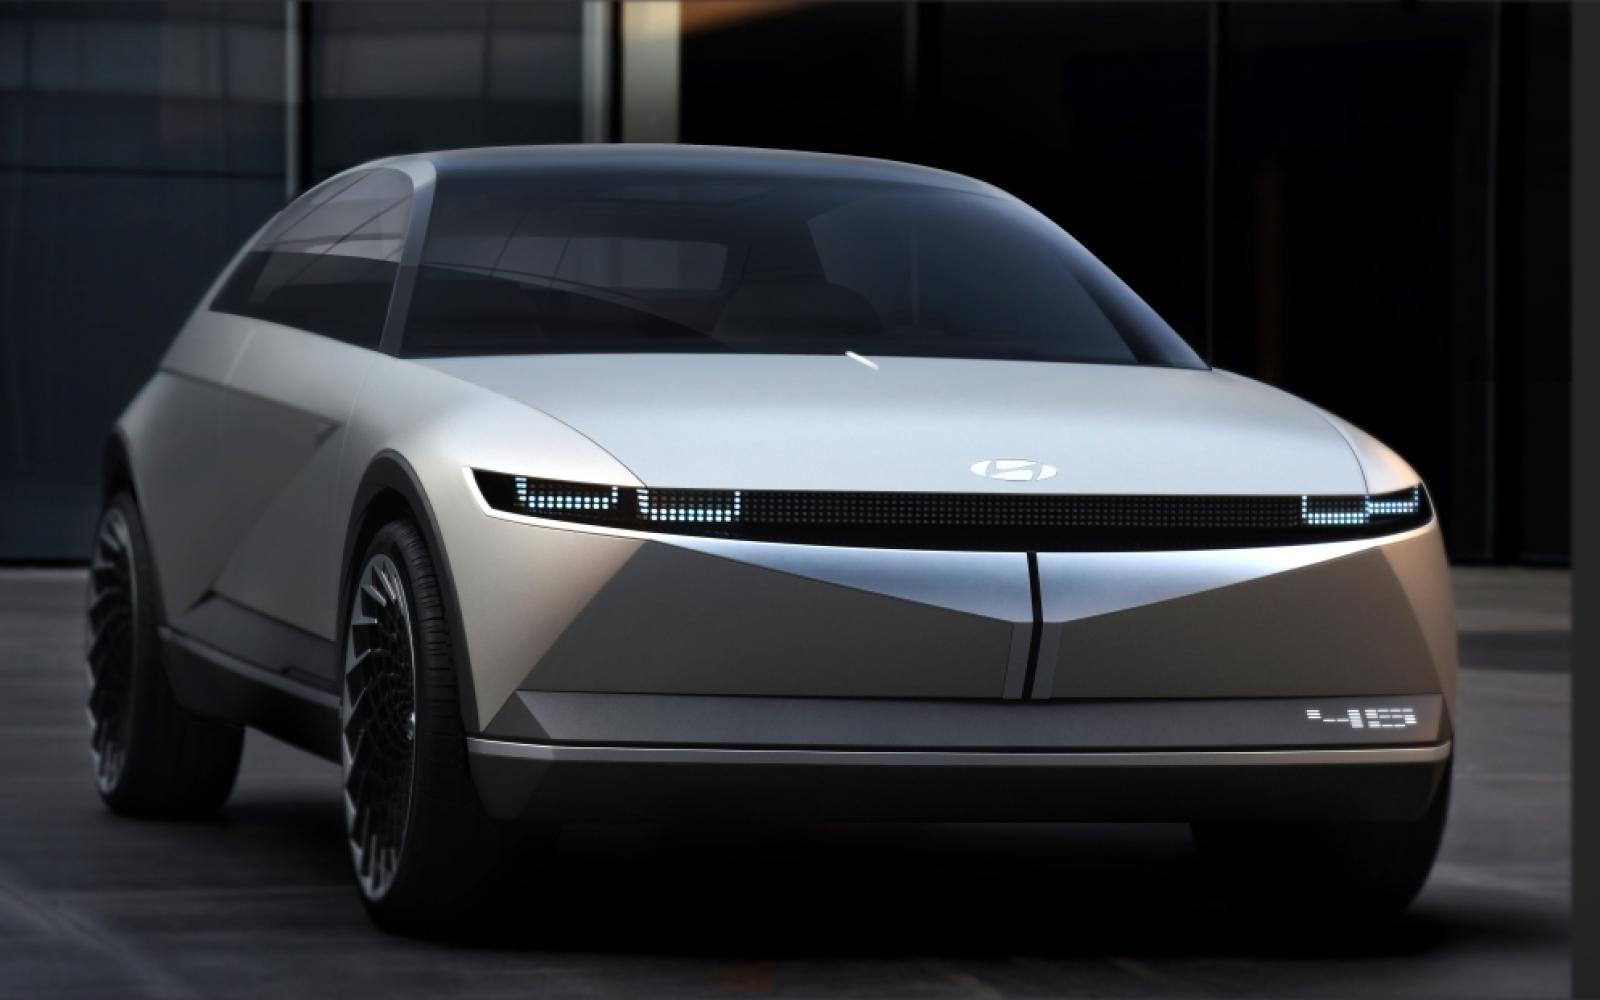 Ioniq 5 Komt Eraan Hyundai Lanceert Begin 2021 Elektrisch Submerk Autowereld Com